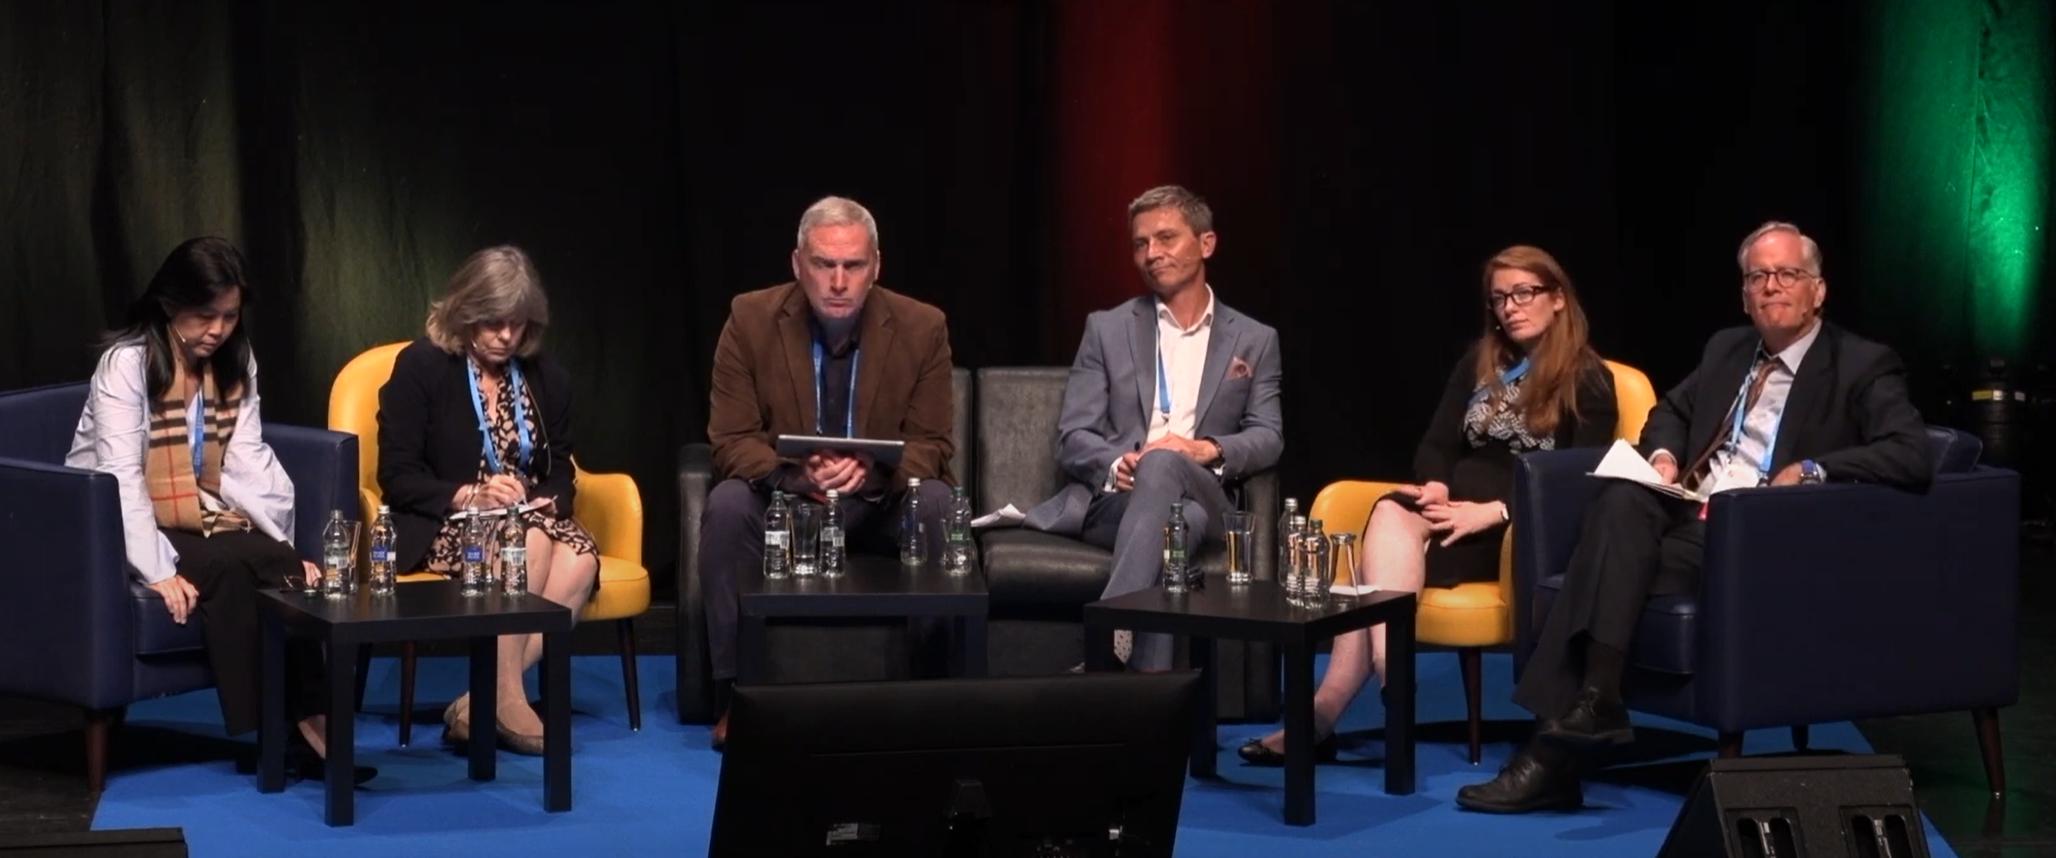 UNESCO cyberbullying panel WABF 2019